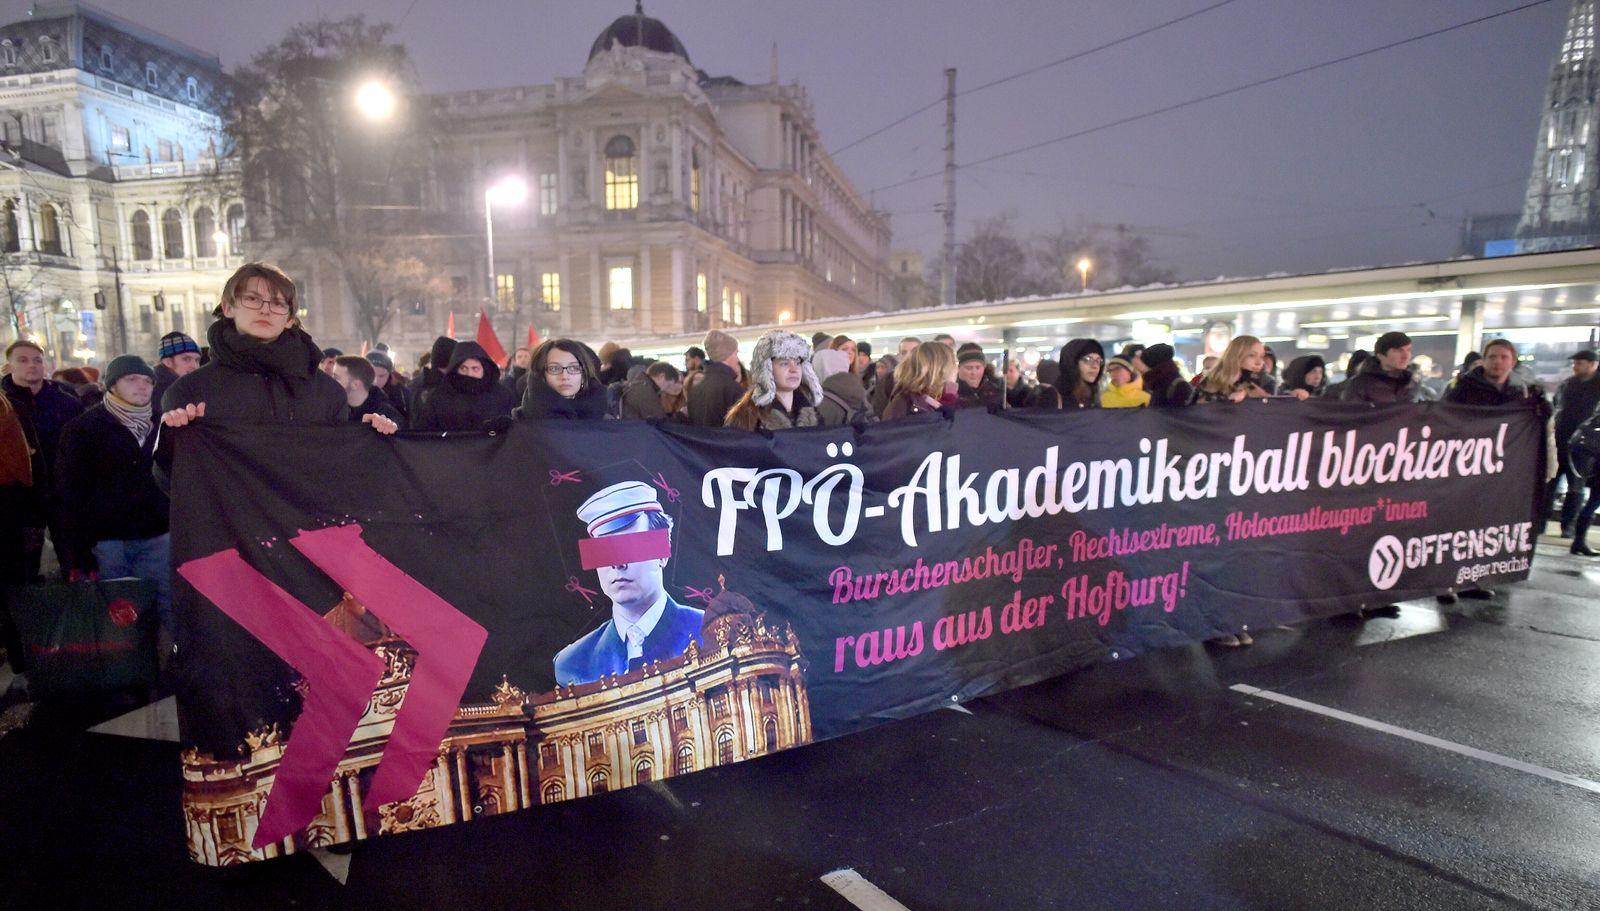 Demo FPÖ-Akademikerball blockieren